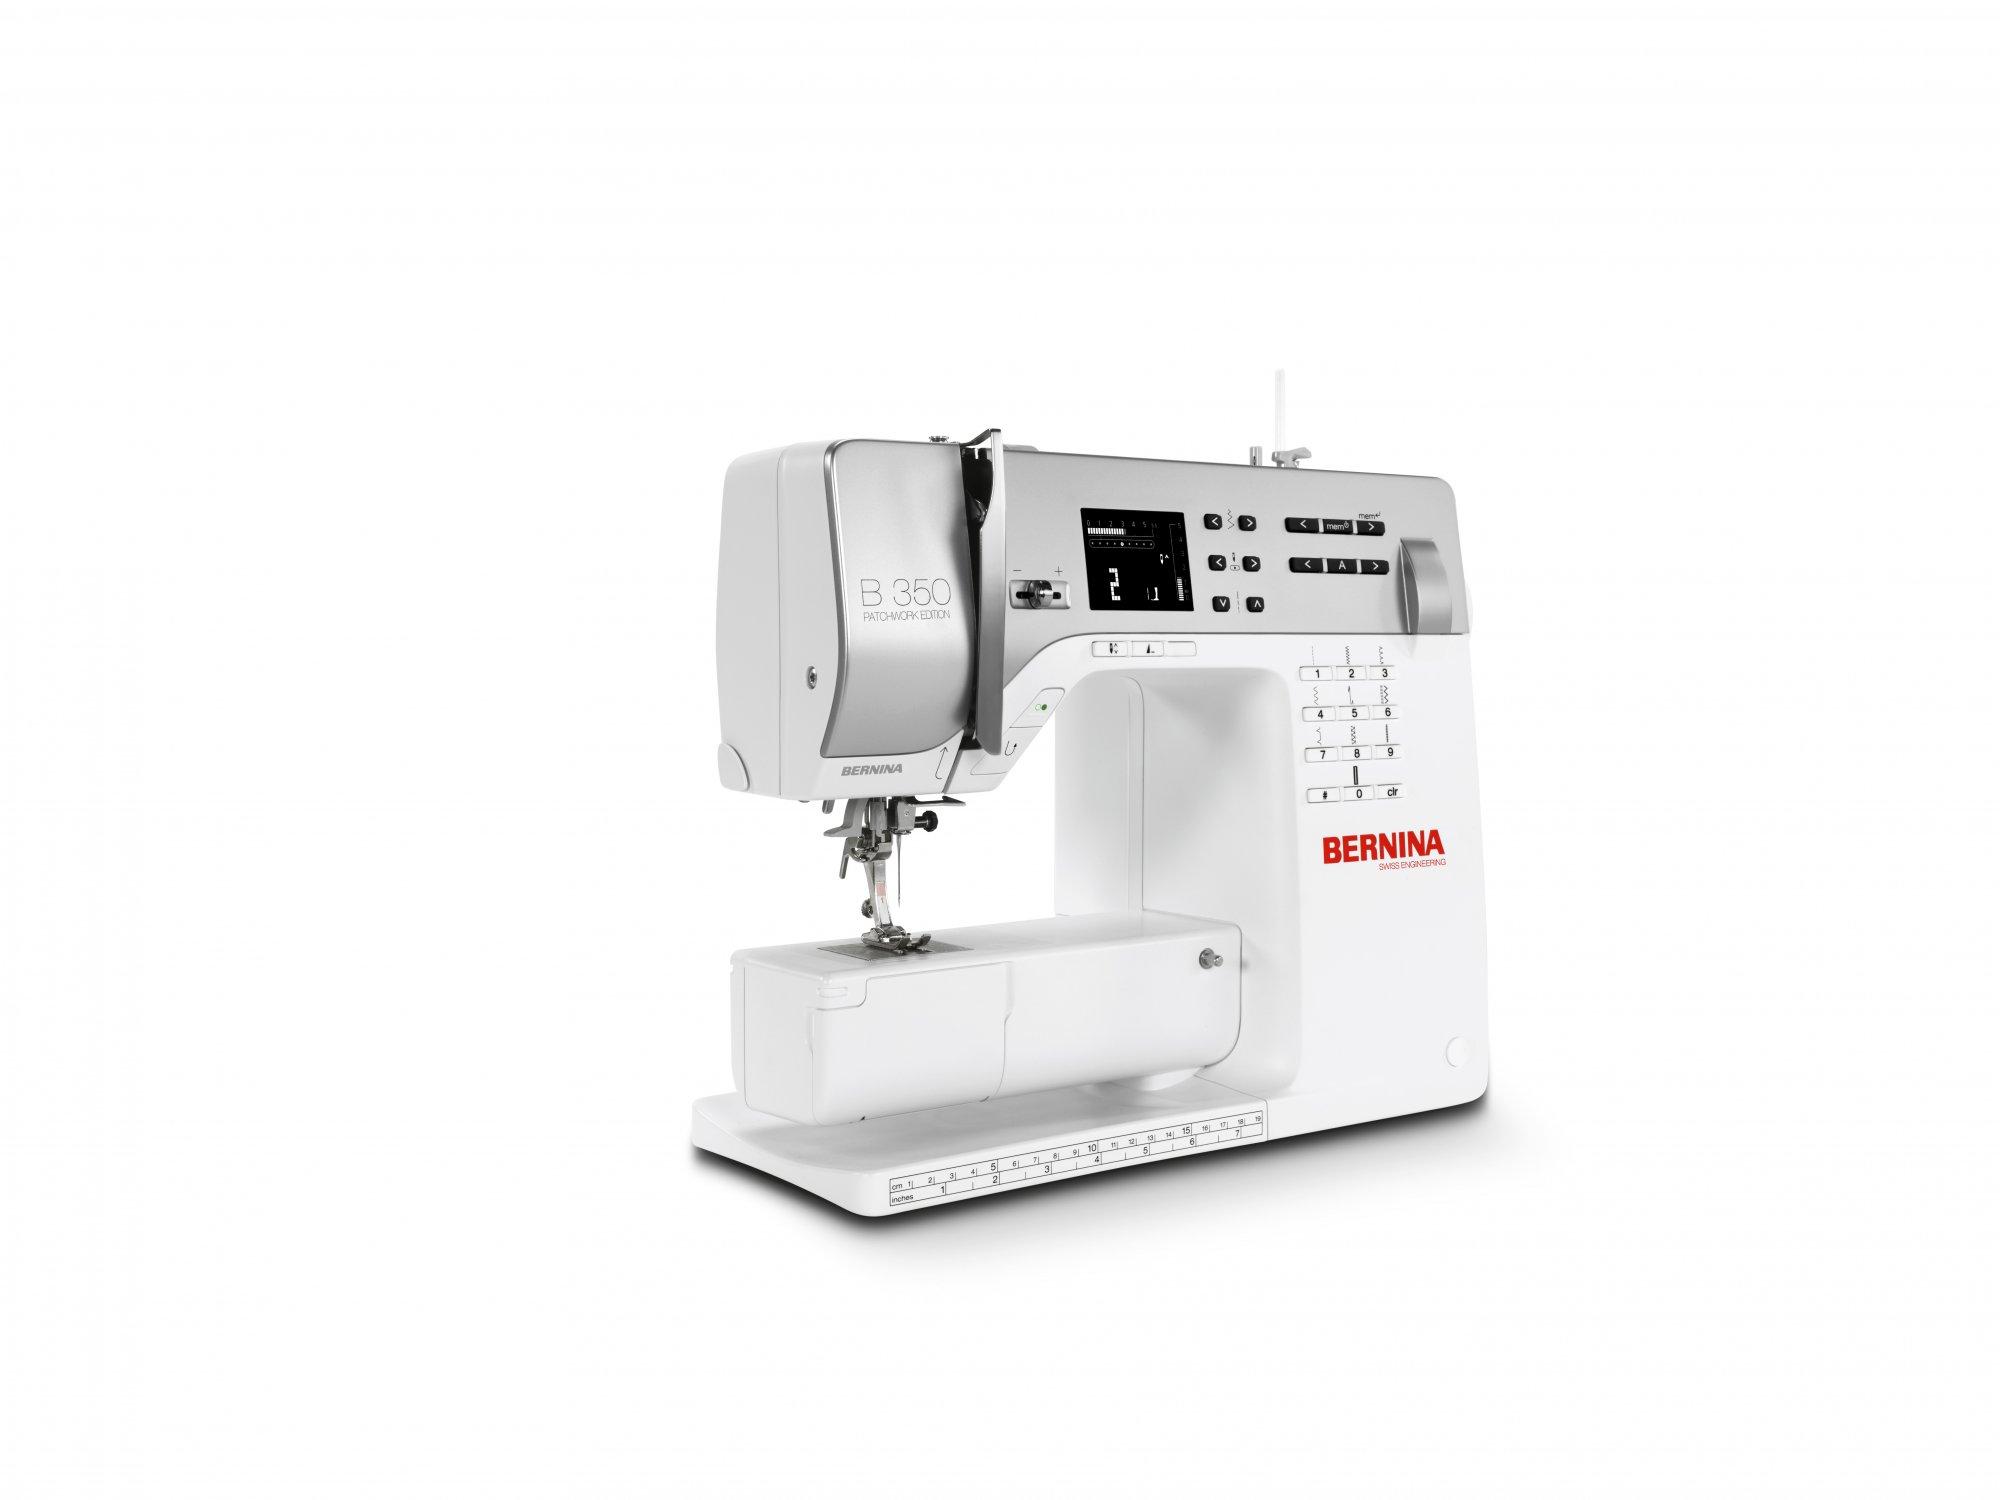 bernina 350 pe sewing machine